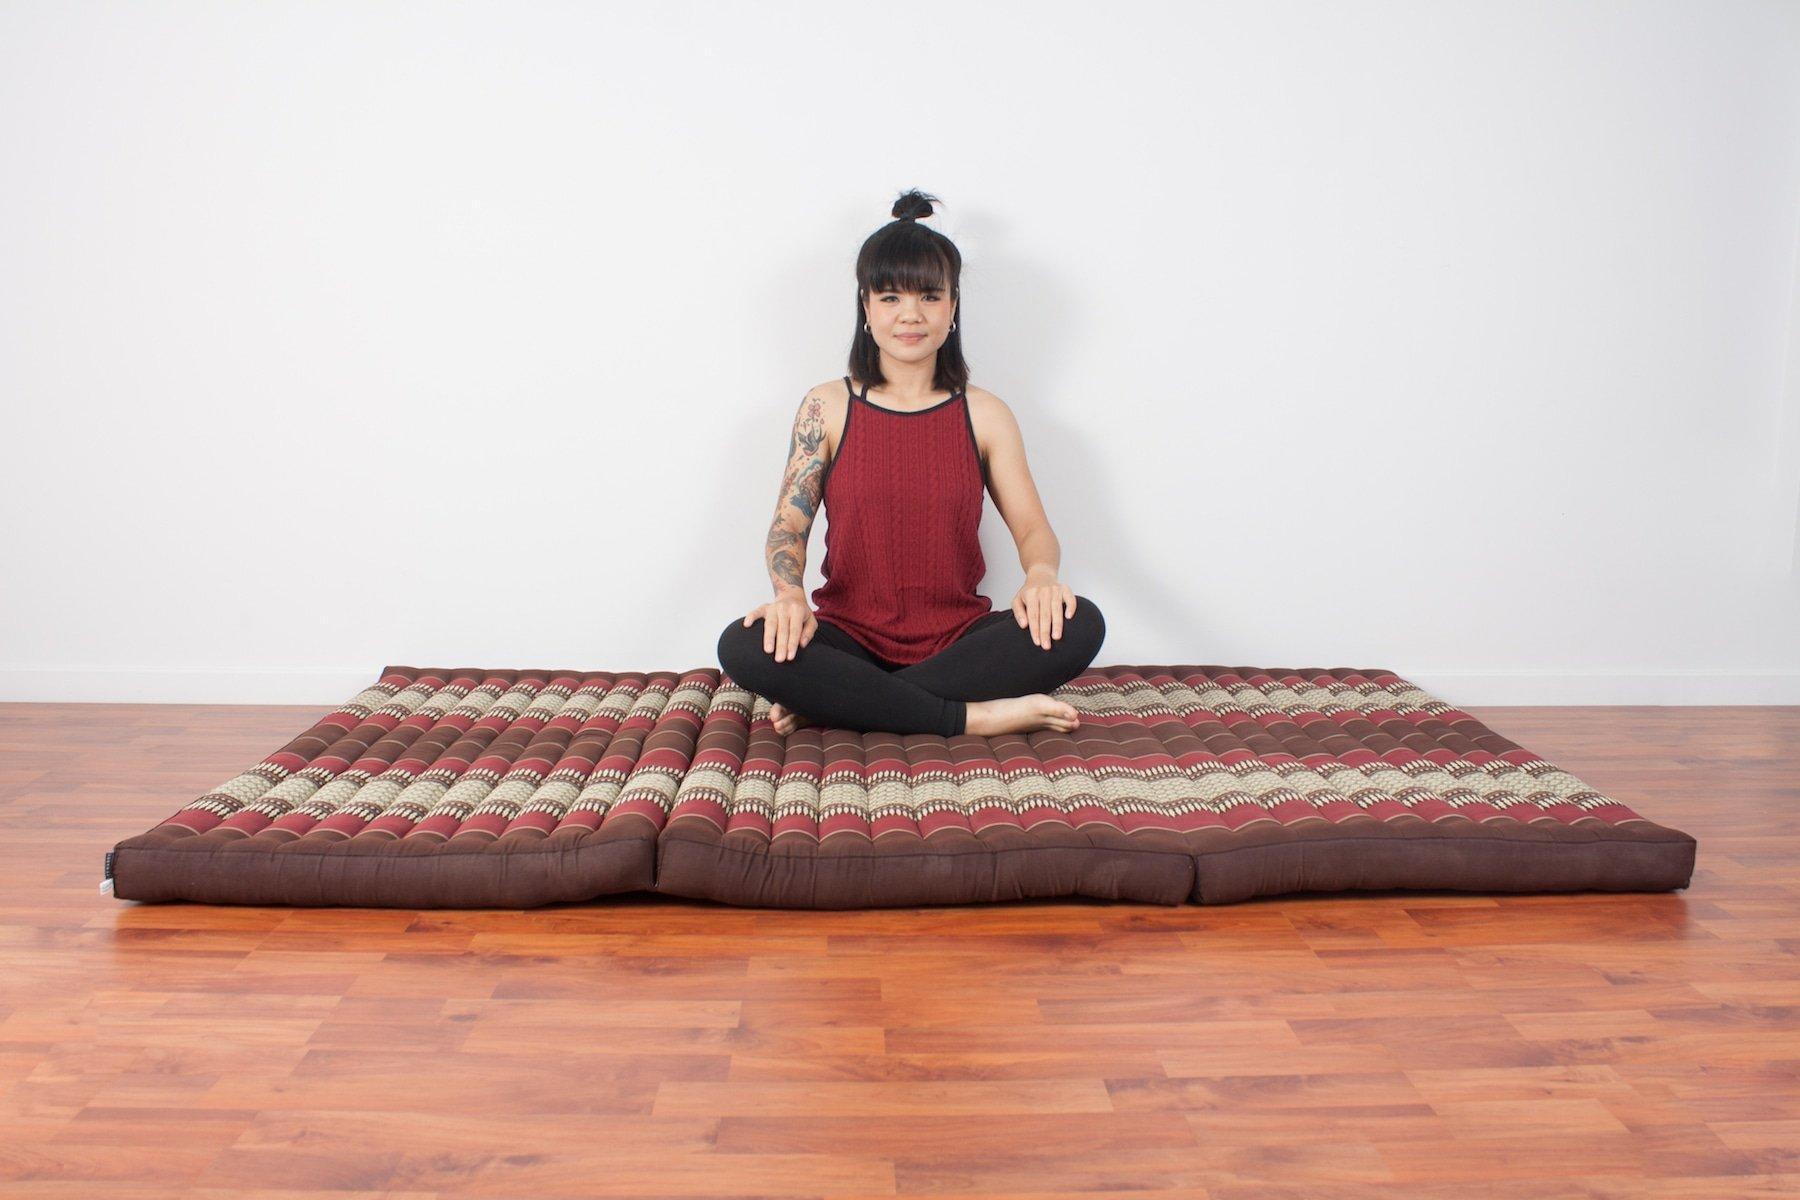 Leewadee Thai Massage Mat XL, 82x46x3 inches, Kapok, brown red by Leewadee (Image #4)